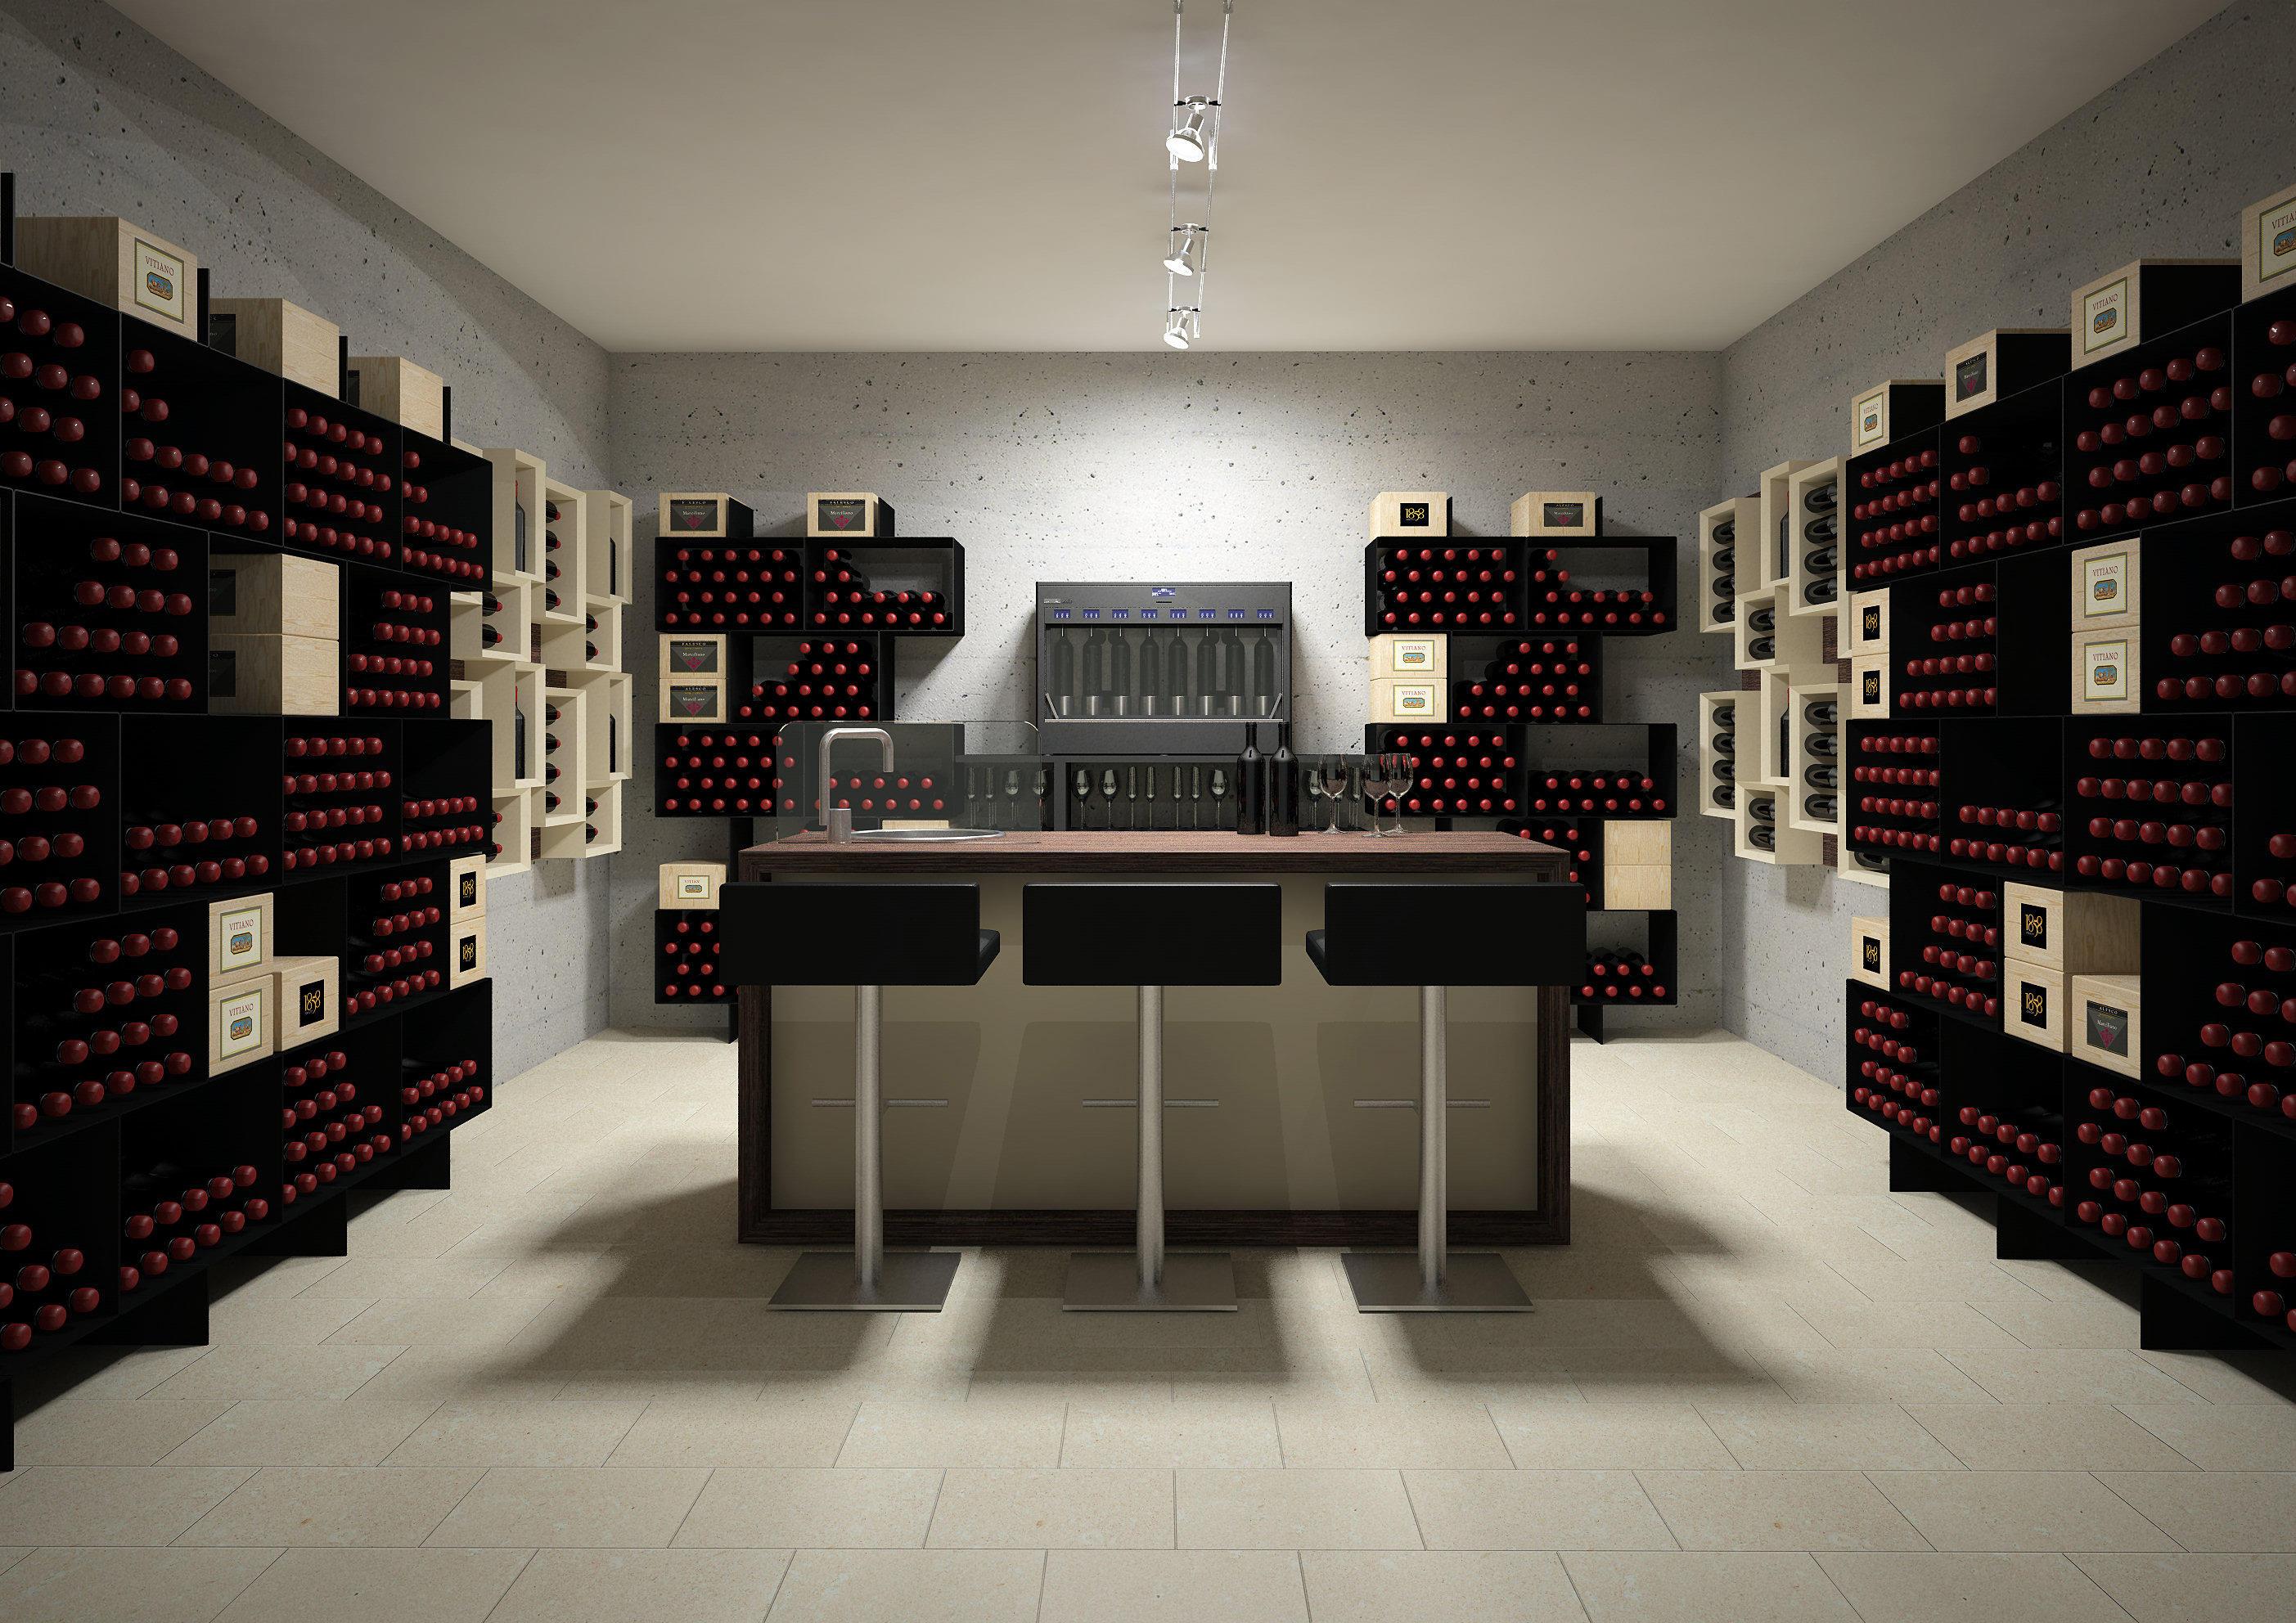 esigo 2 box wine rack wine racks from esigo architonic. Black Bedroom Furniture Sets. Home Design Ideas